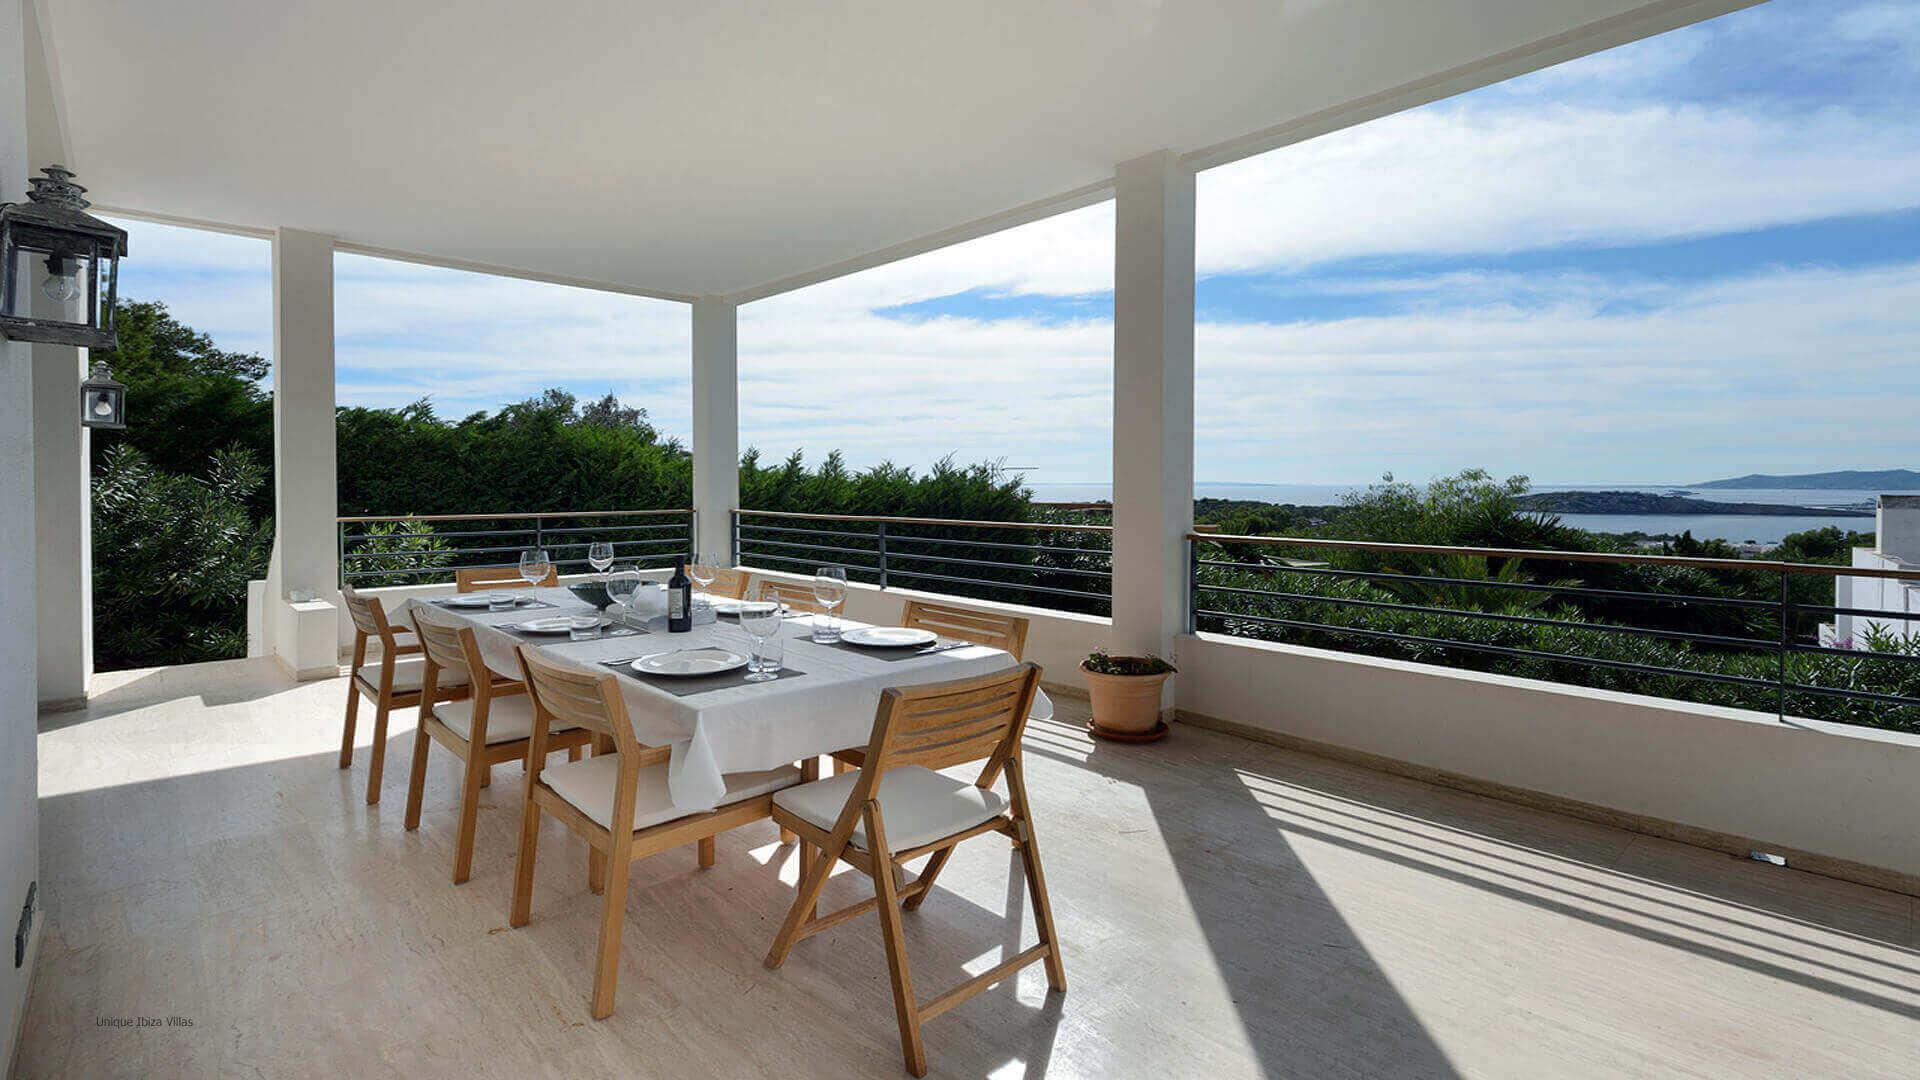 Villa Margarita Ibiza 13 First Floor Terrace